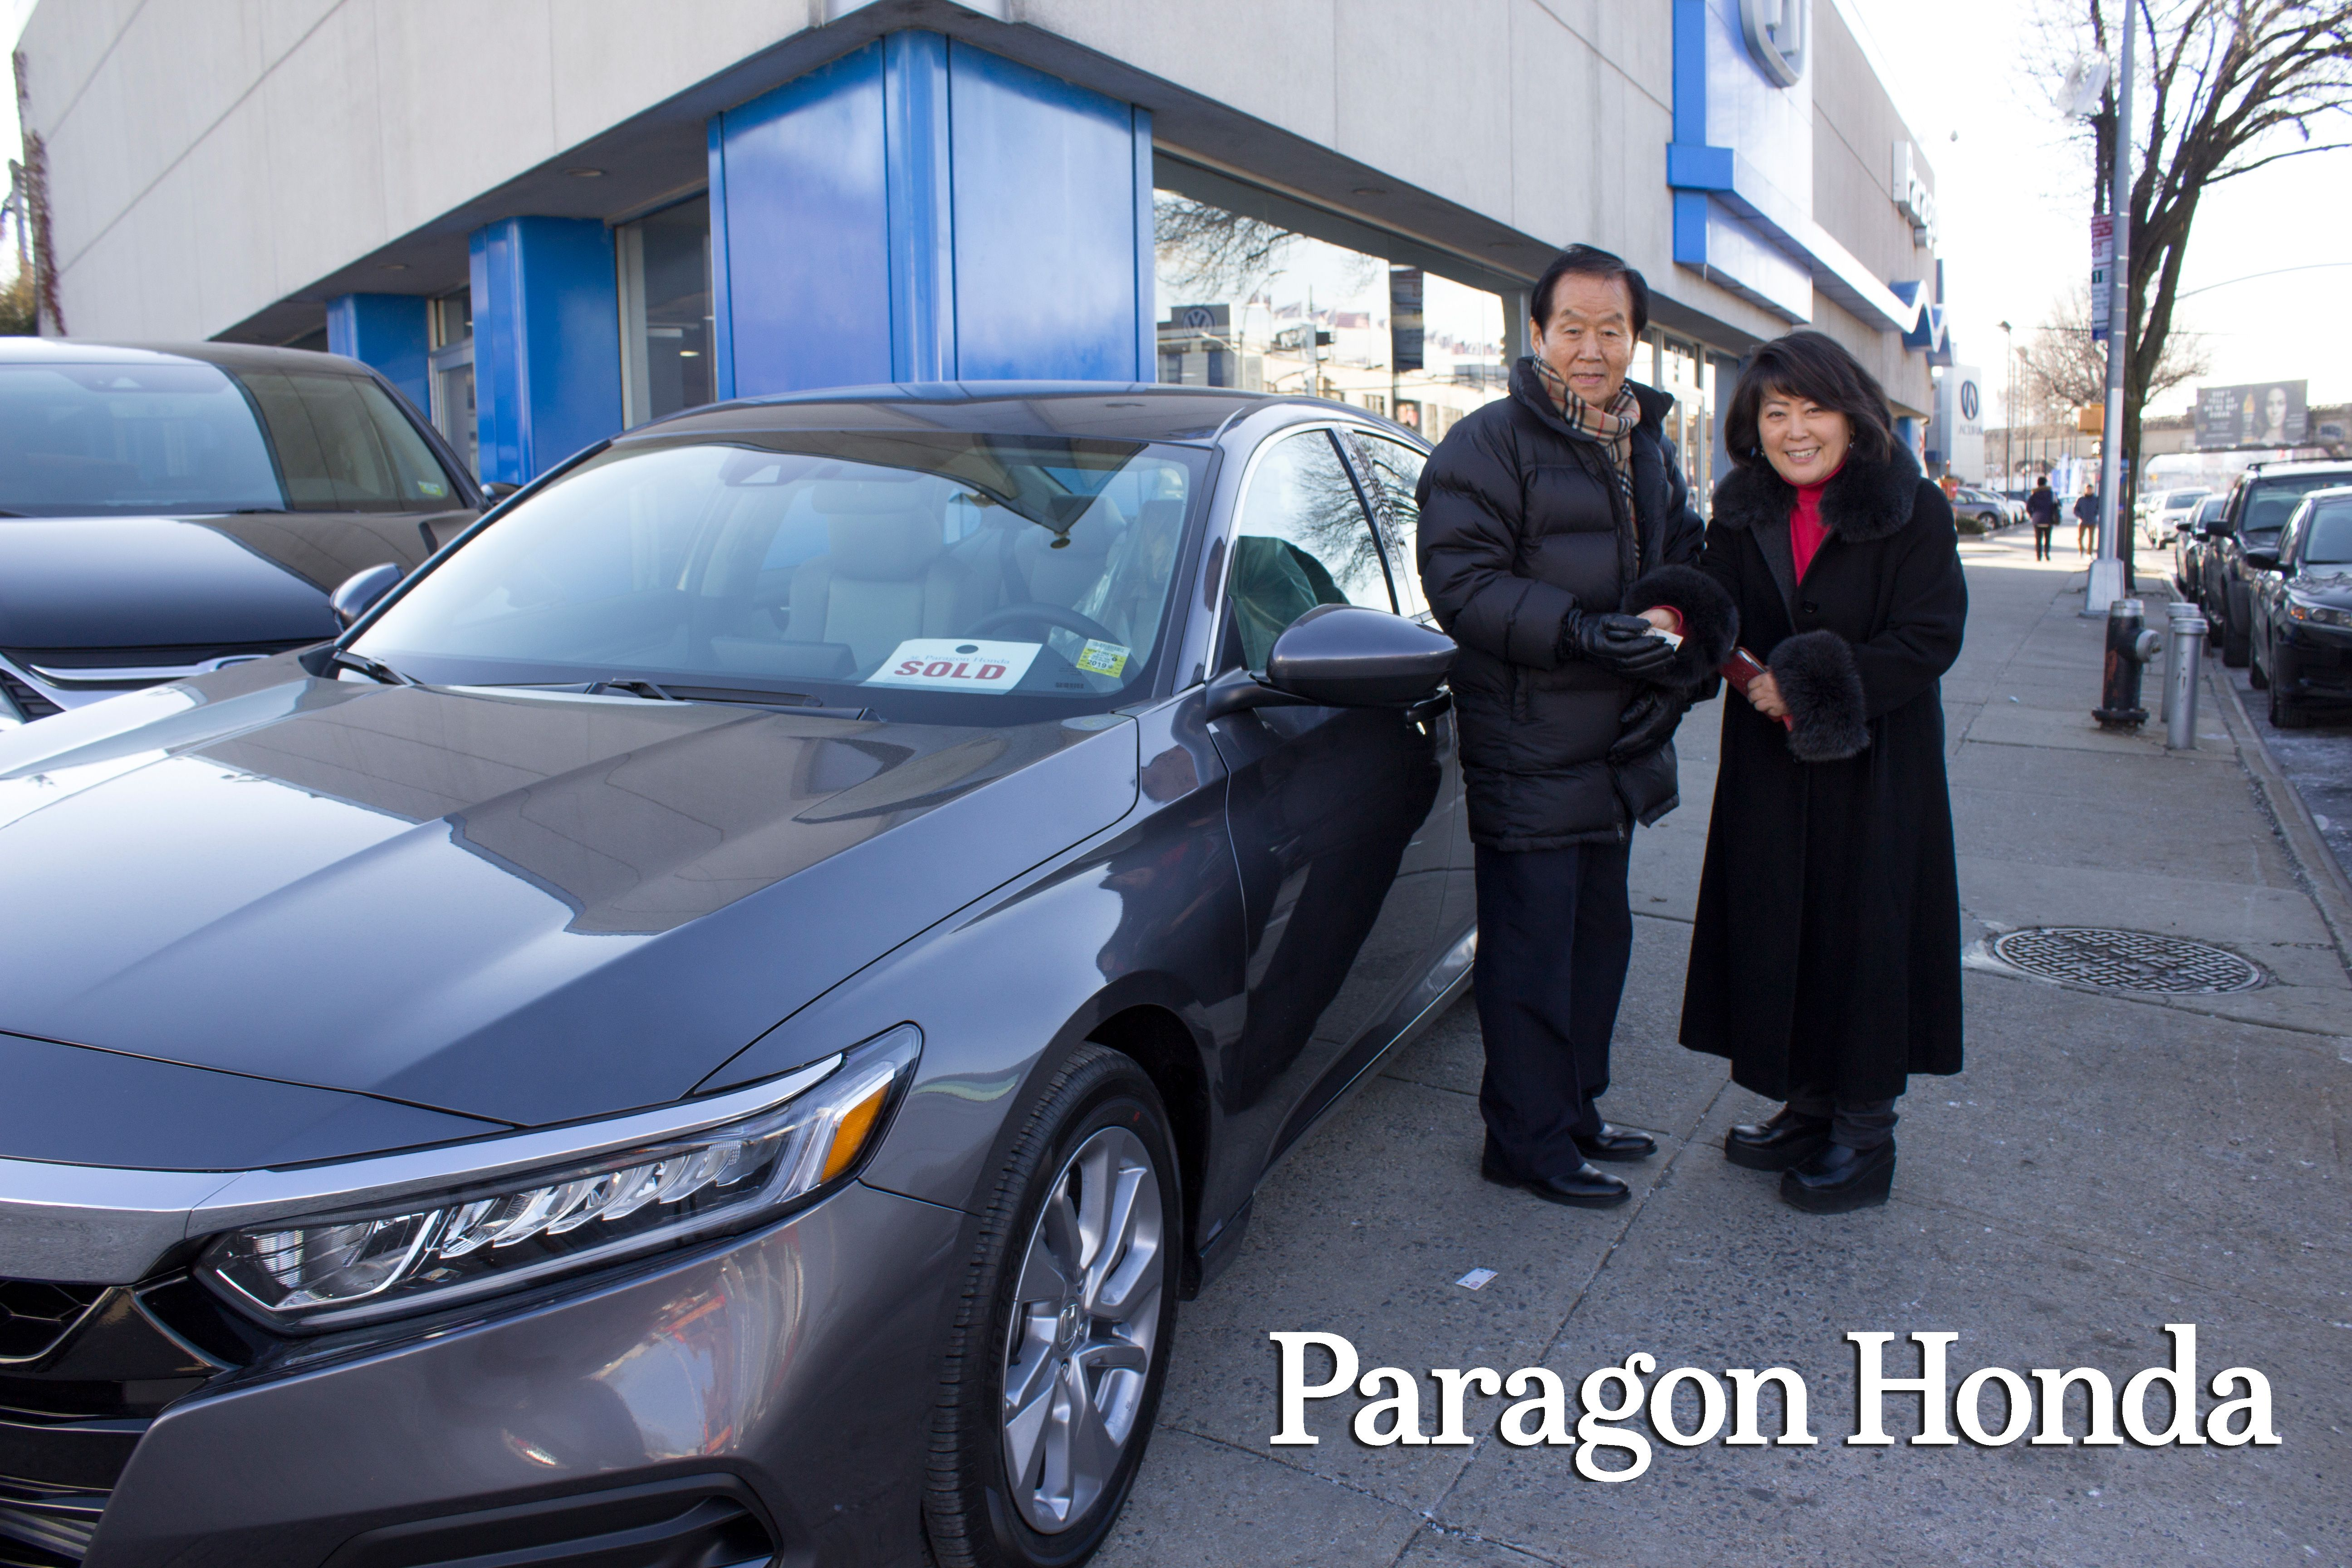 Paragon Honda: New Honda And Used Car Dealer In Woodside, NY